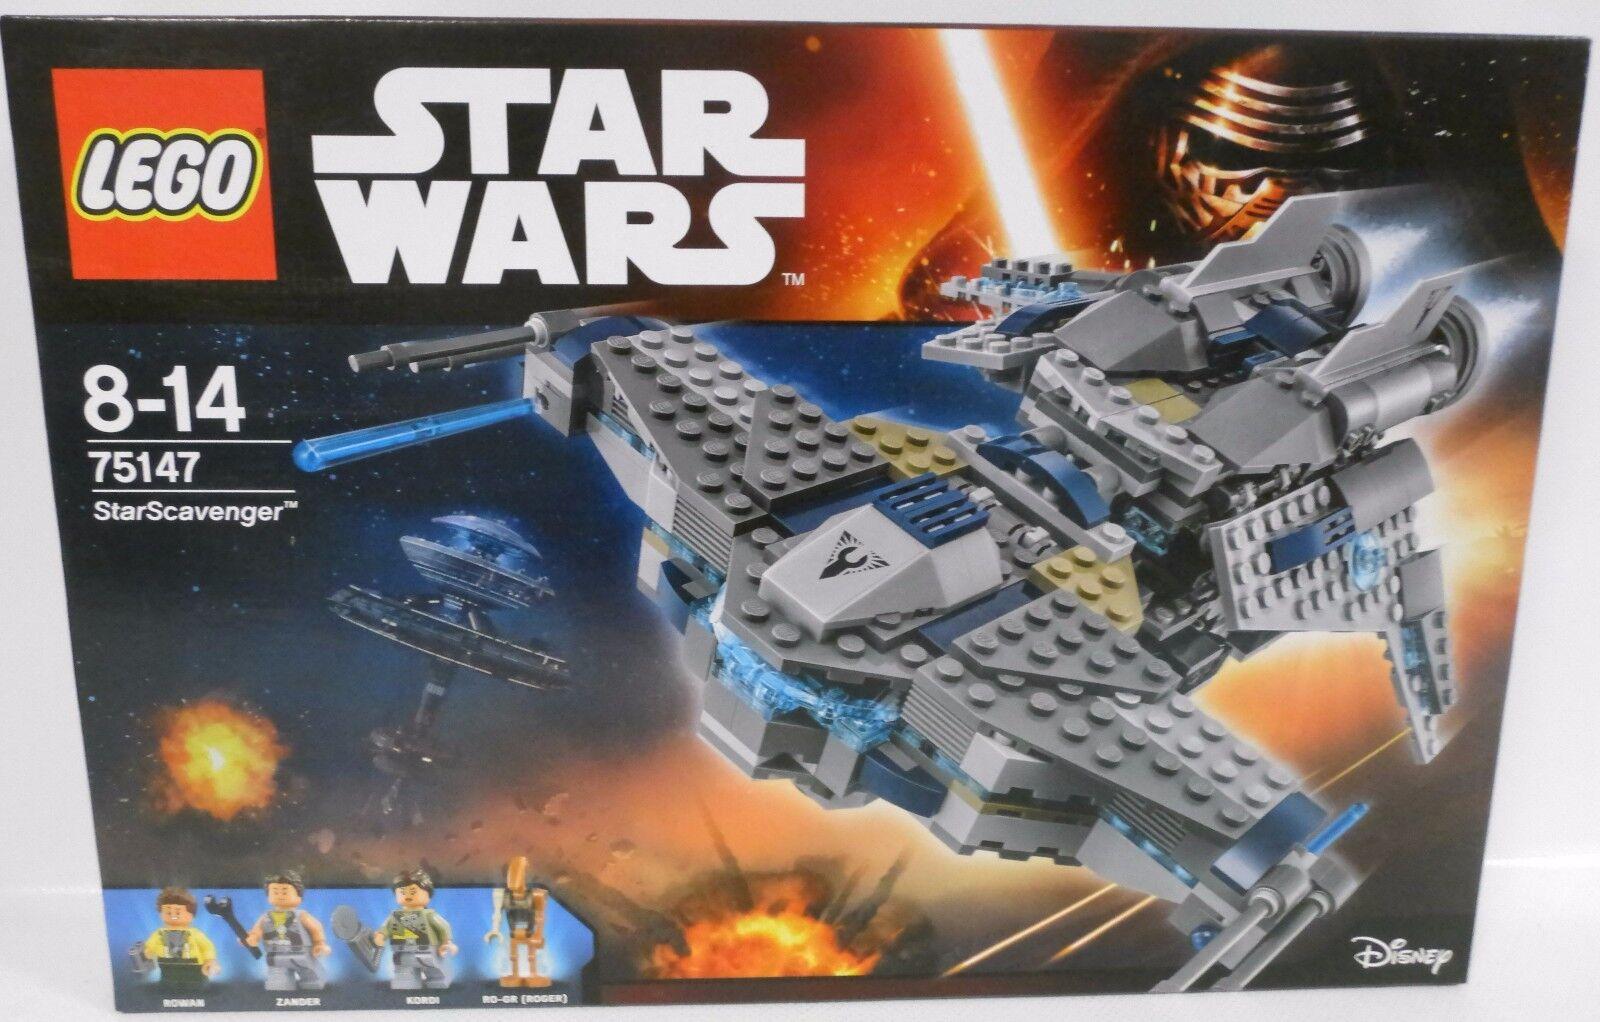 NEU LEGO® Star Wars™ 75147 Star Scavenger™ OVP